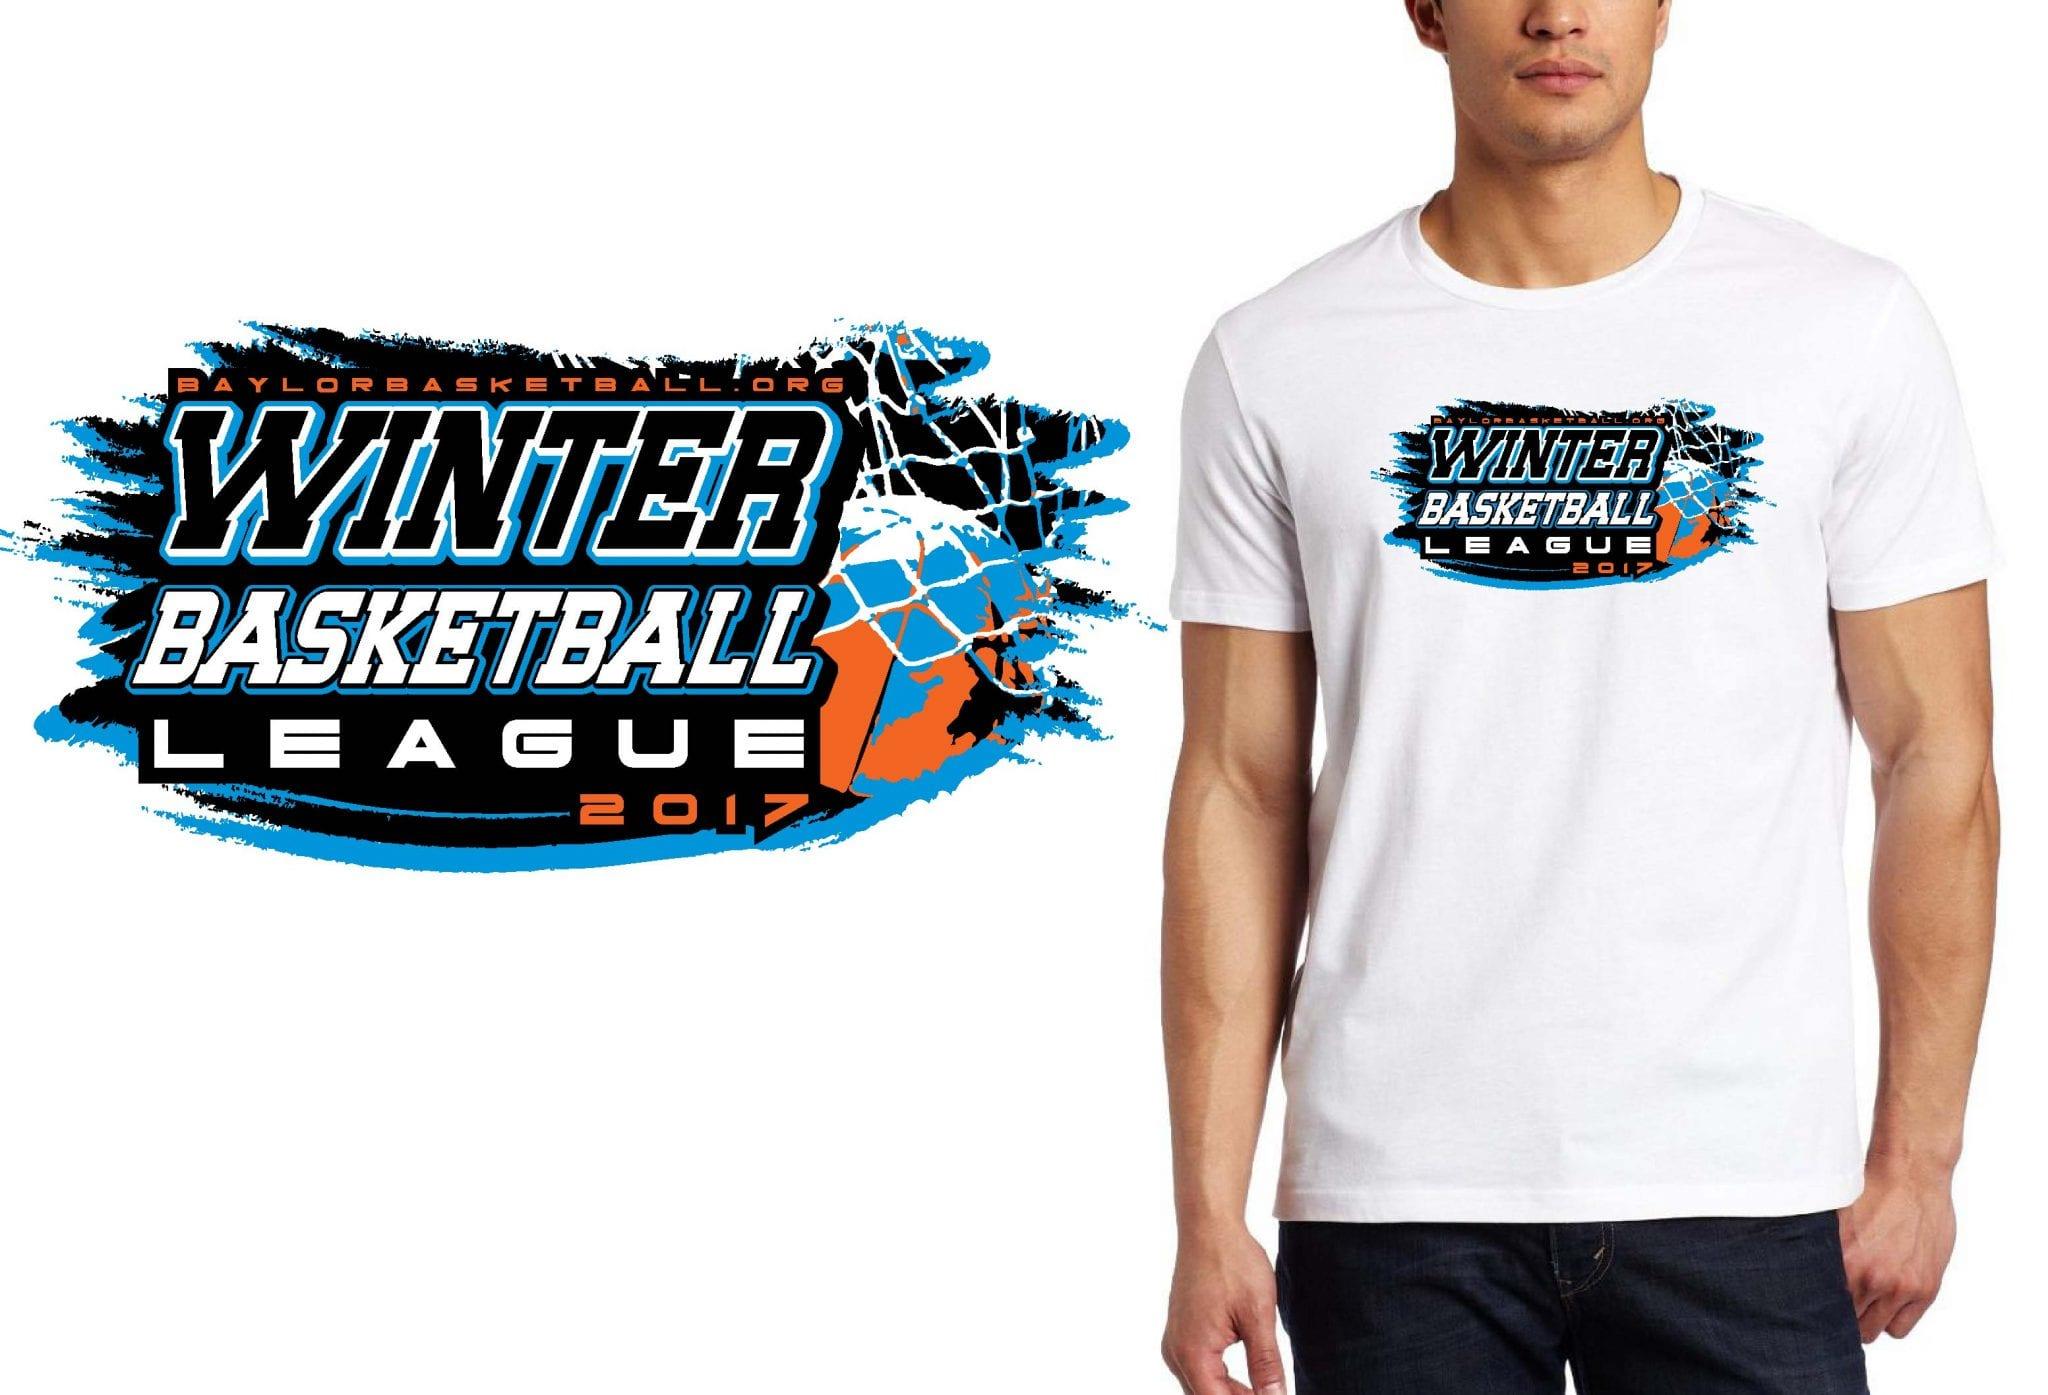 BASKETBALL T SHIRT LOGO DESIGN Baylor-Winter-Basketball-League BY UrArtStudio